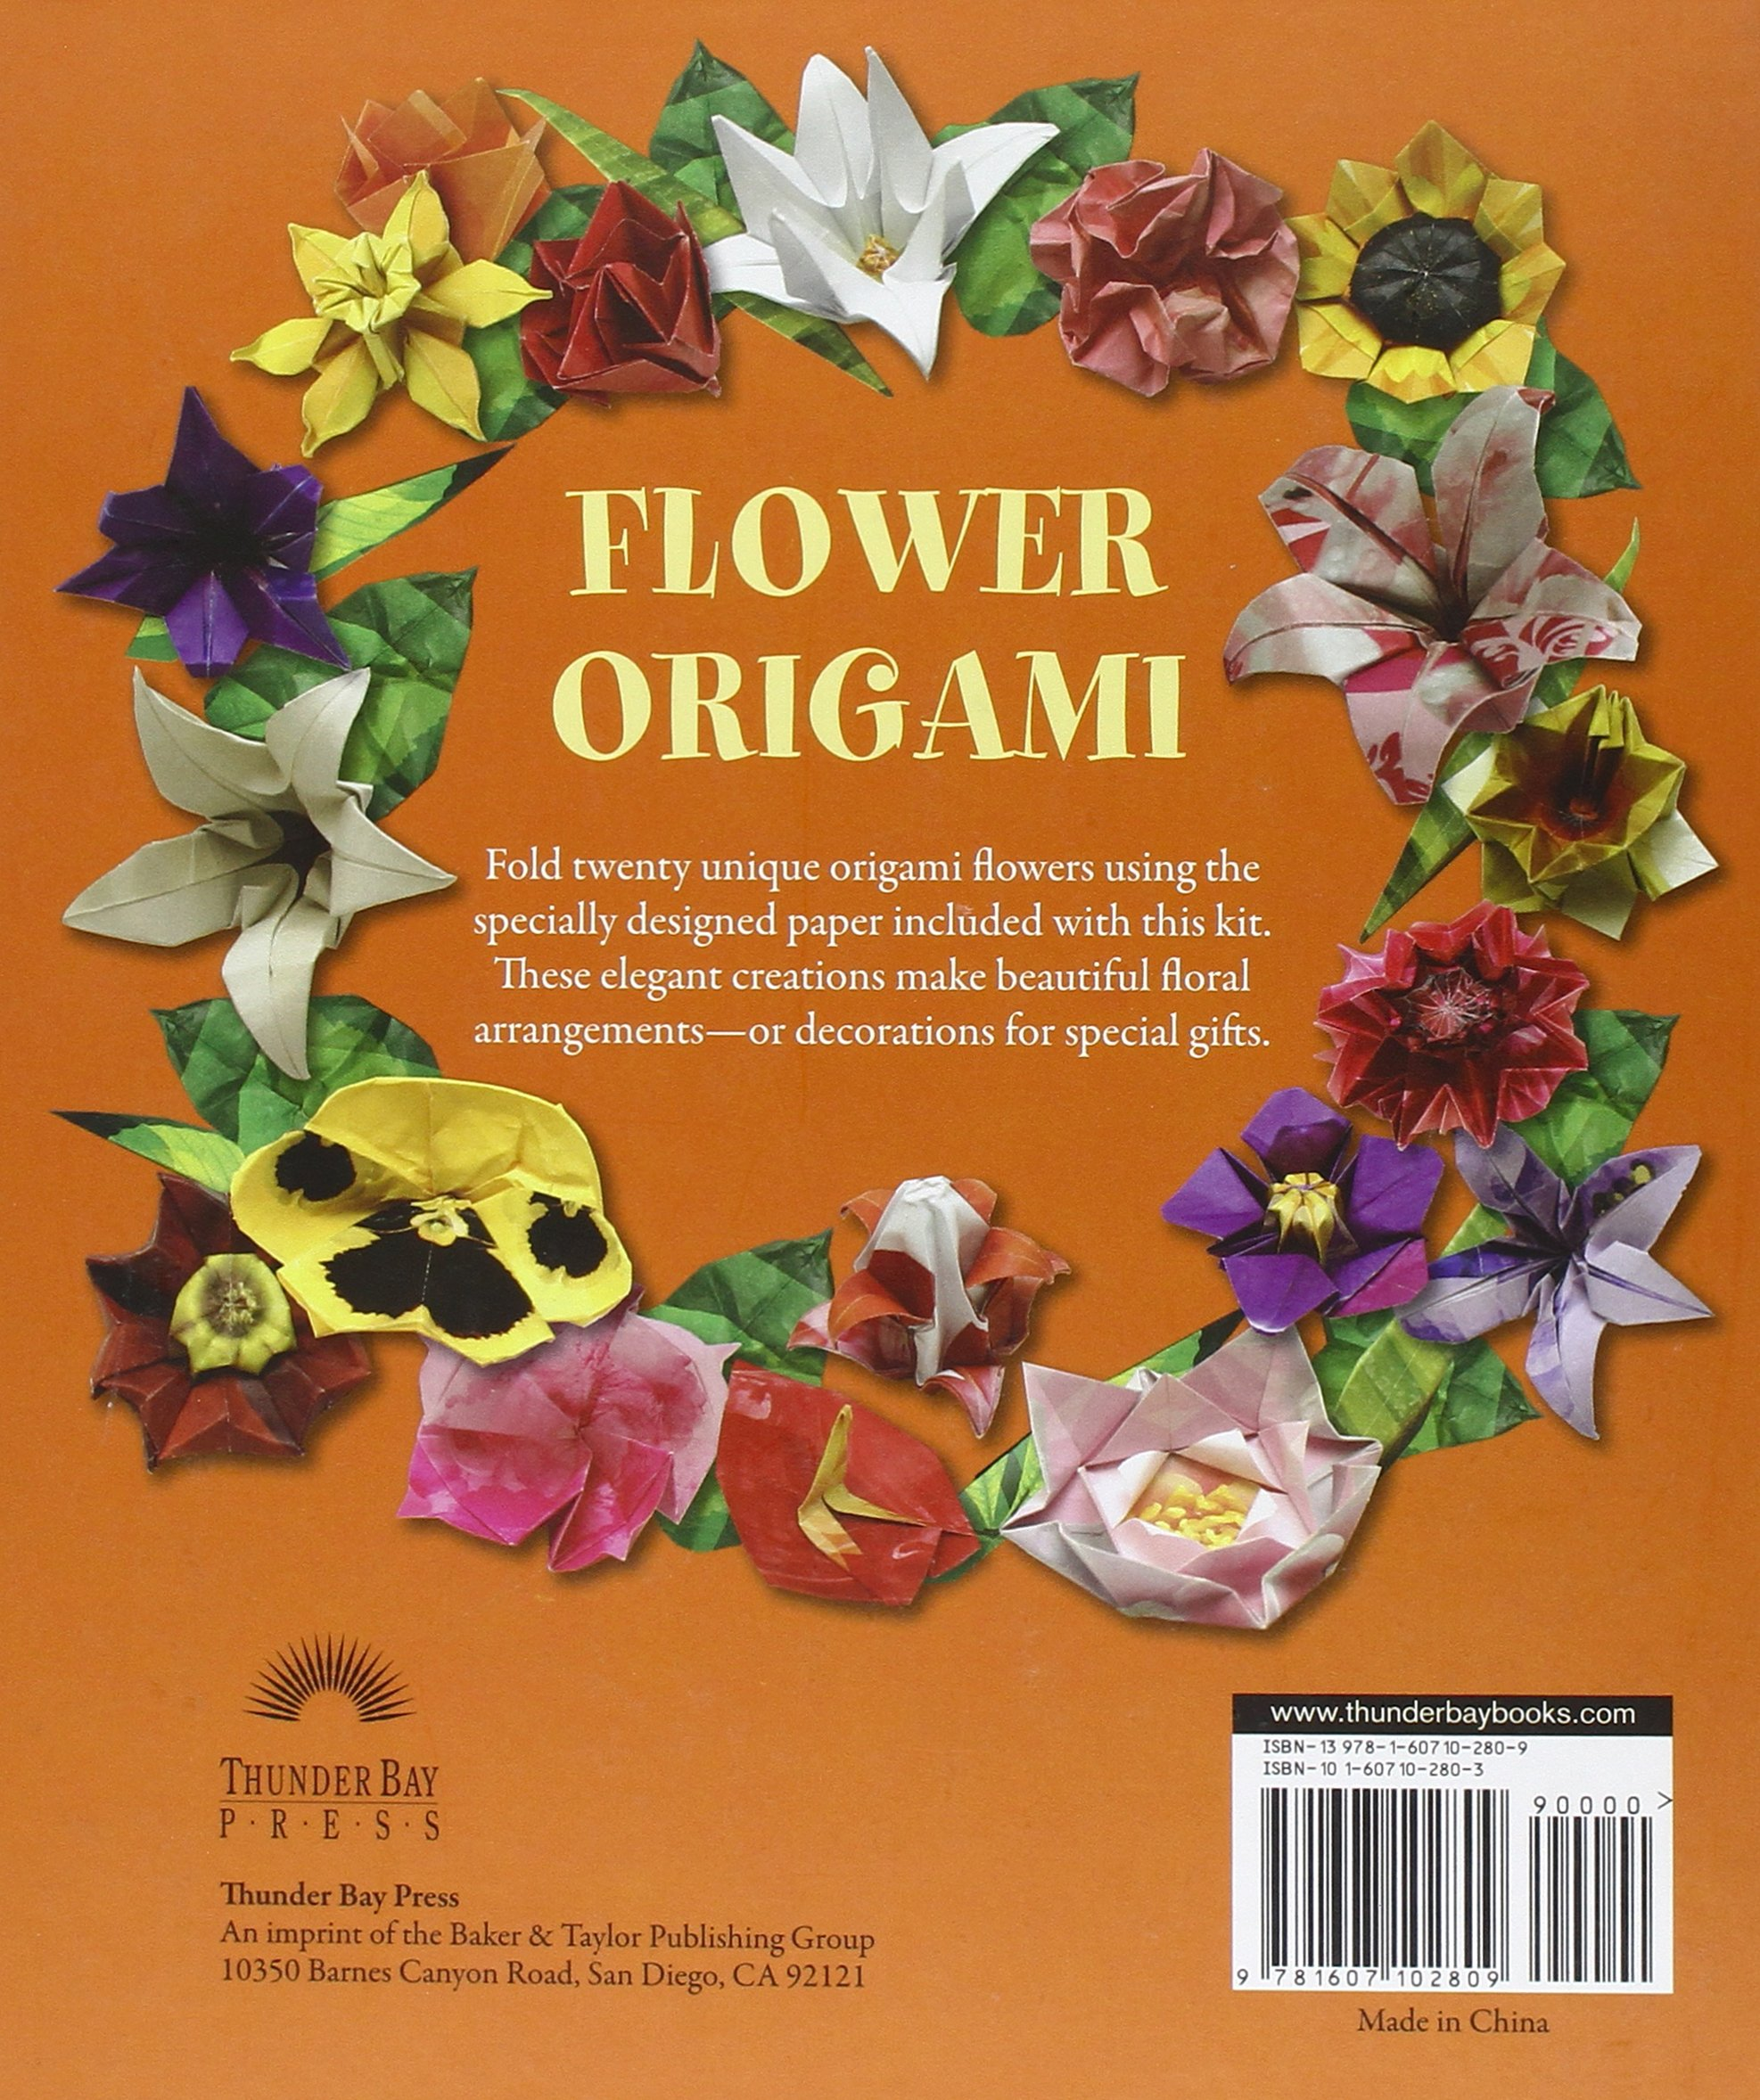 Flower Origami Origami Books Joost Langeveld 9781607102809